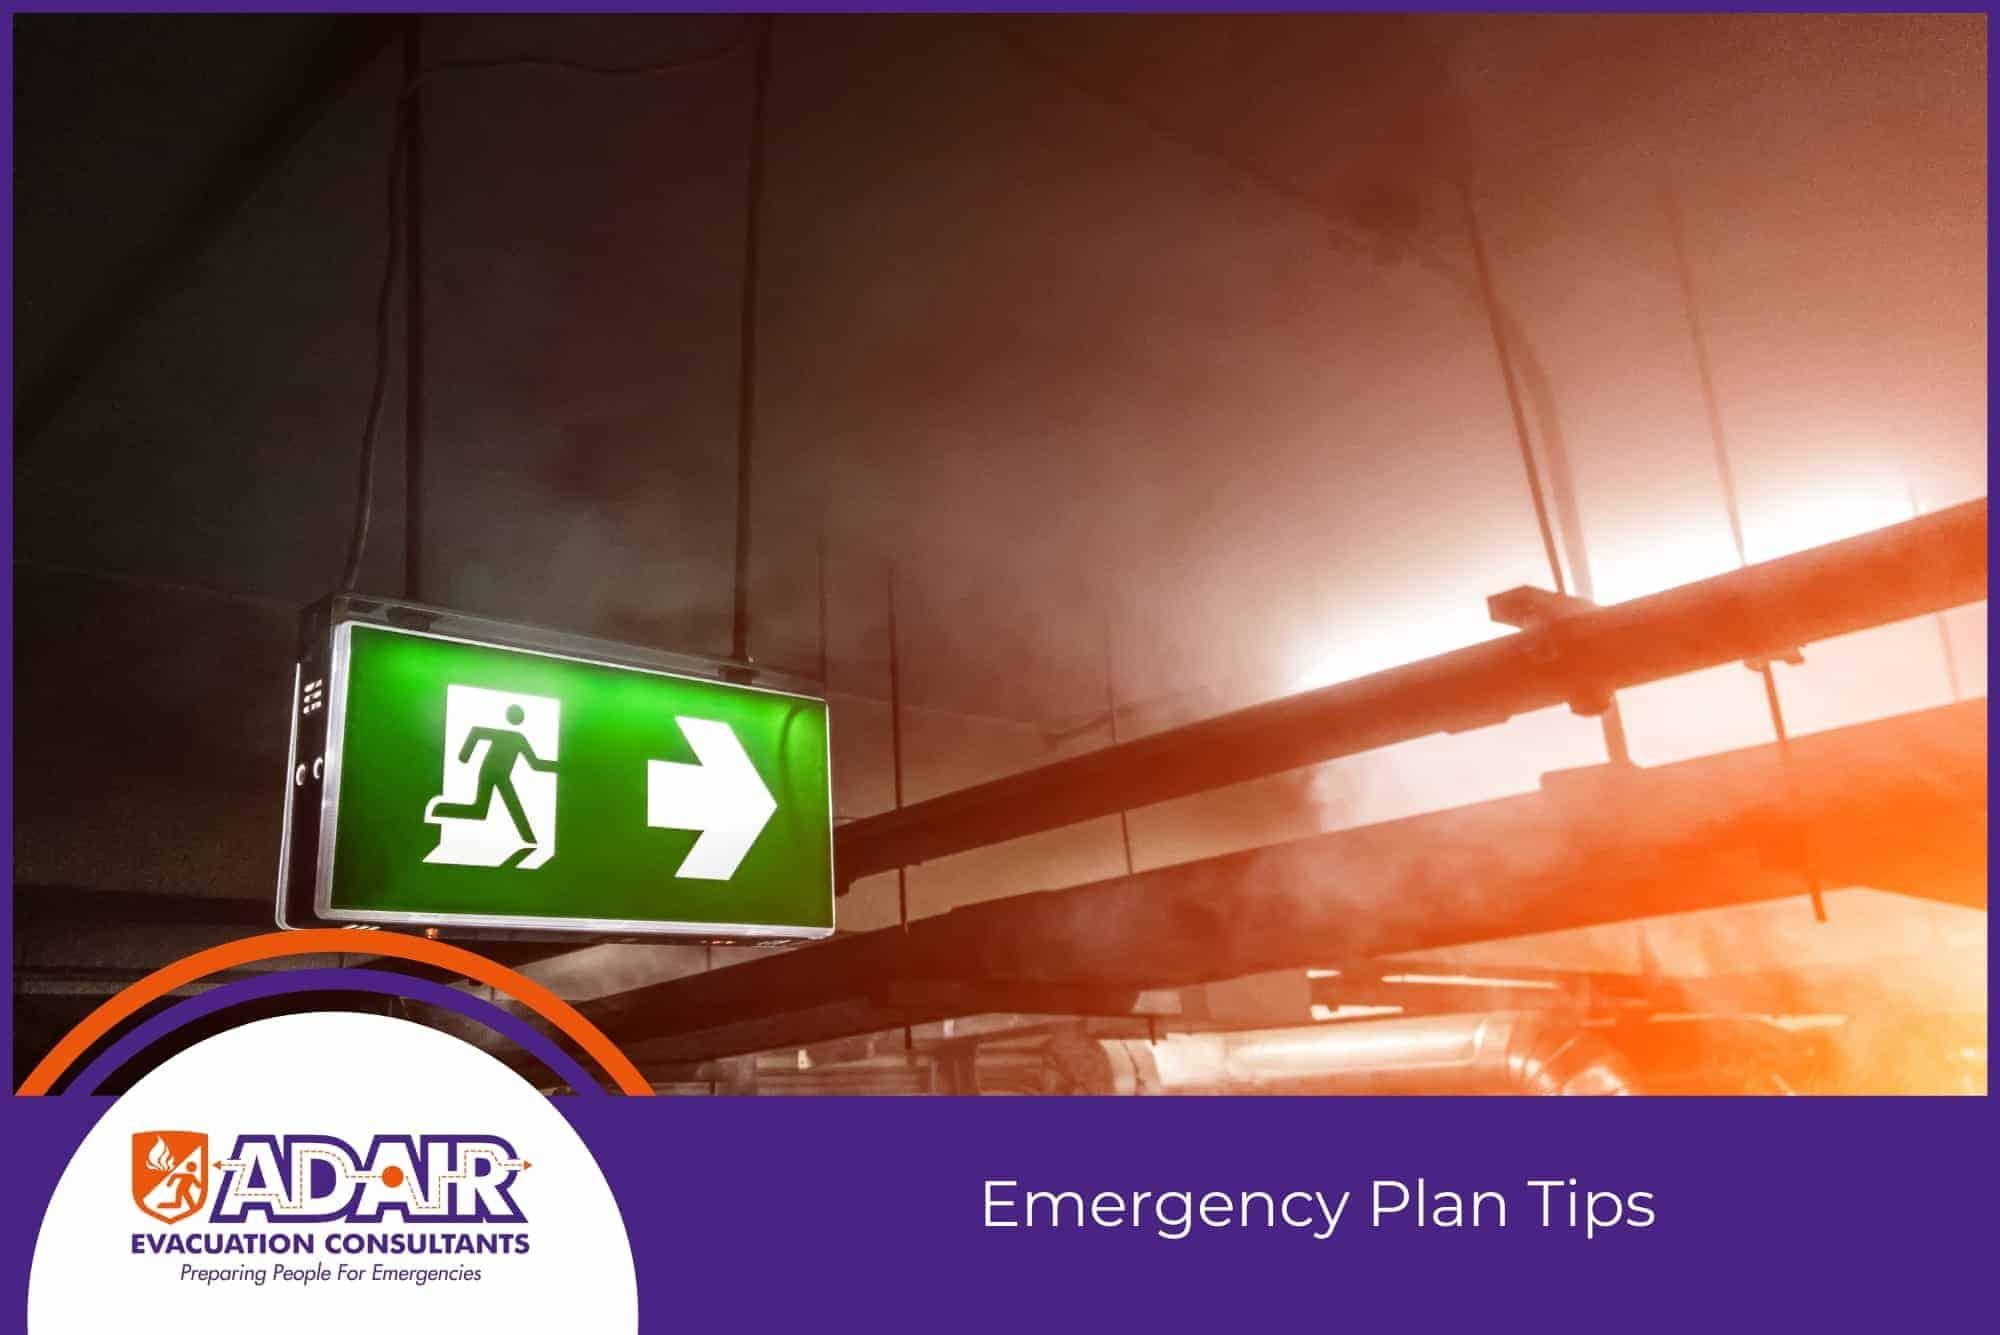 Emergency Plan Tips